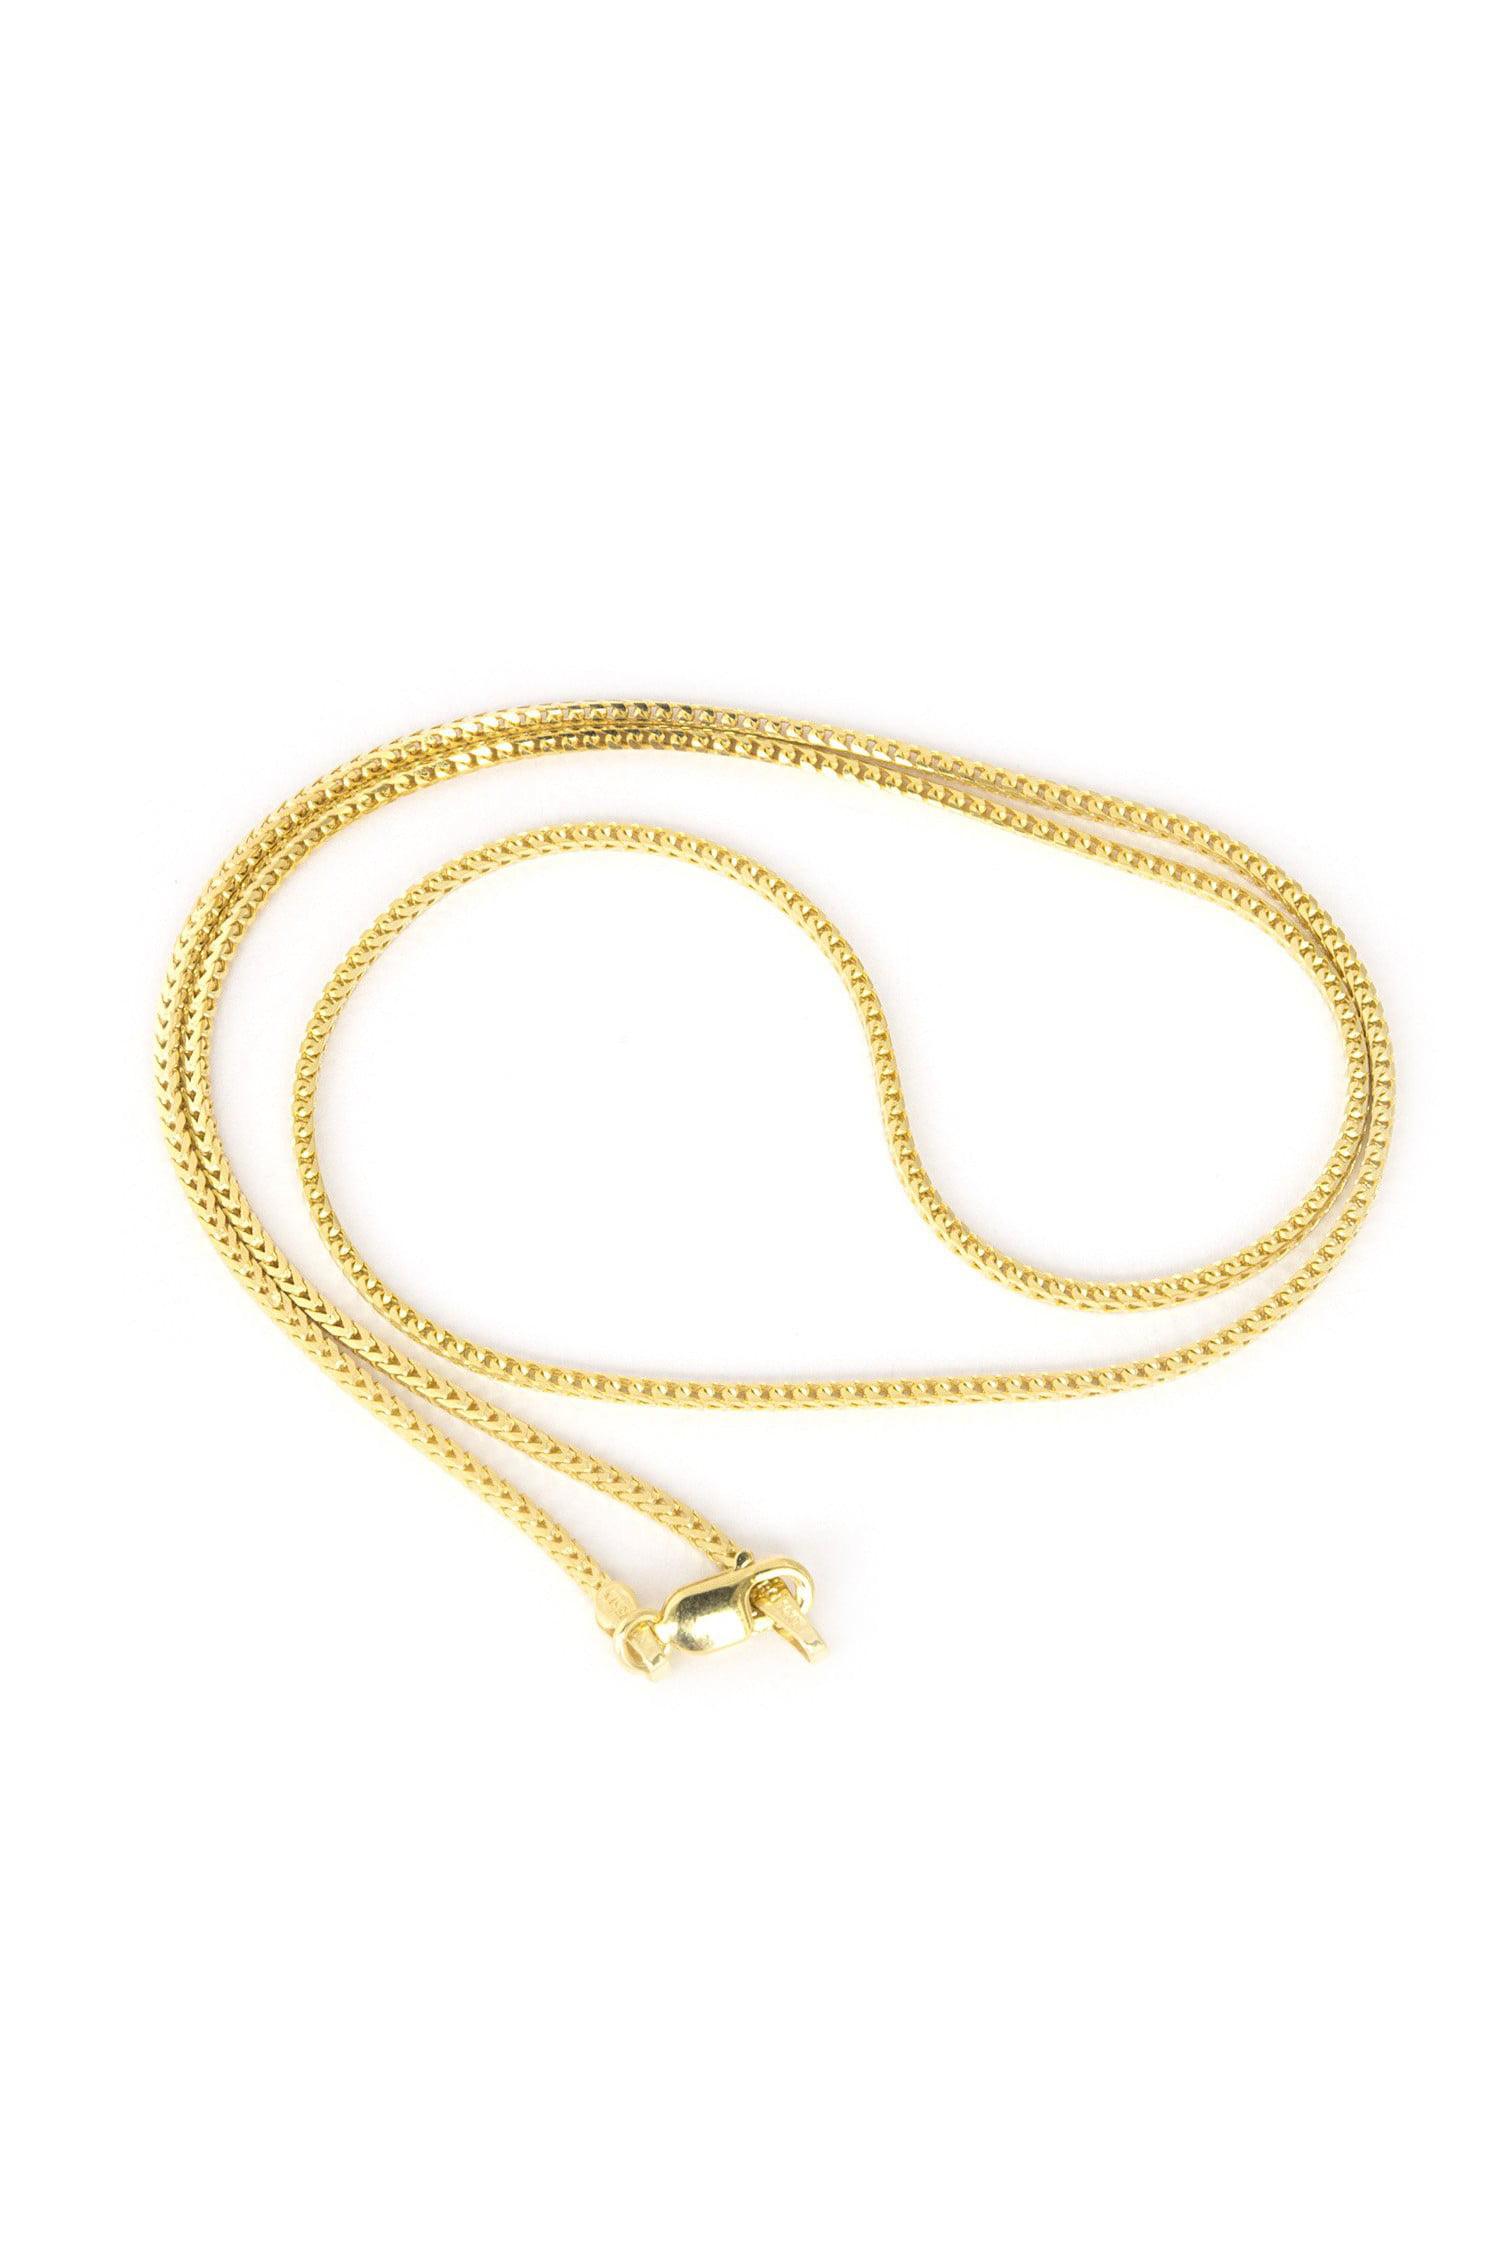 20 inch 18 inch 14K White Gold 1.2 Franco Chain in 16 inch 24 inch